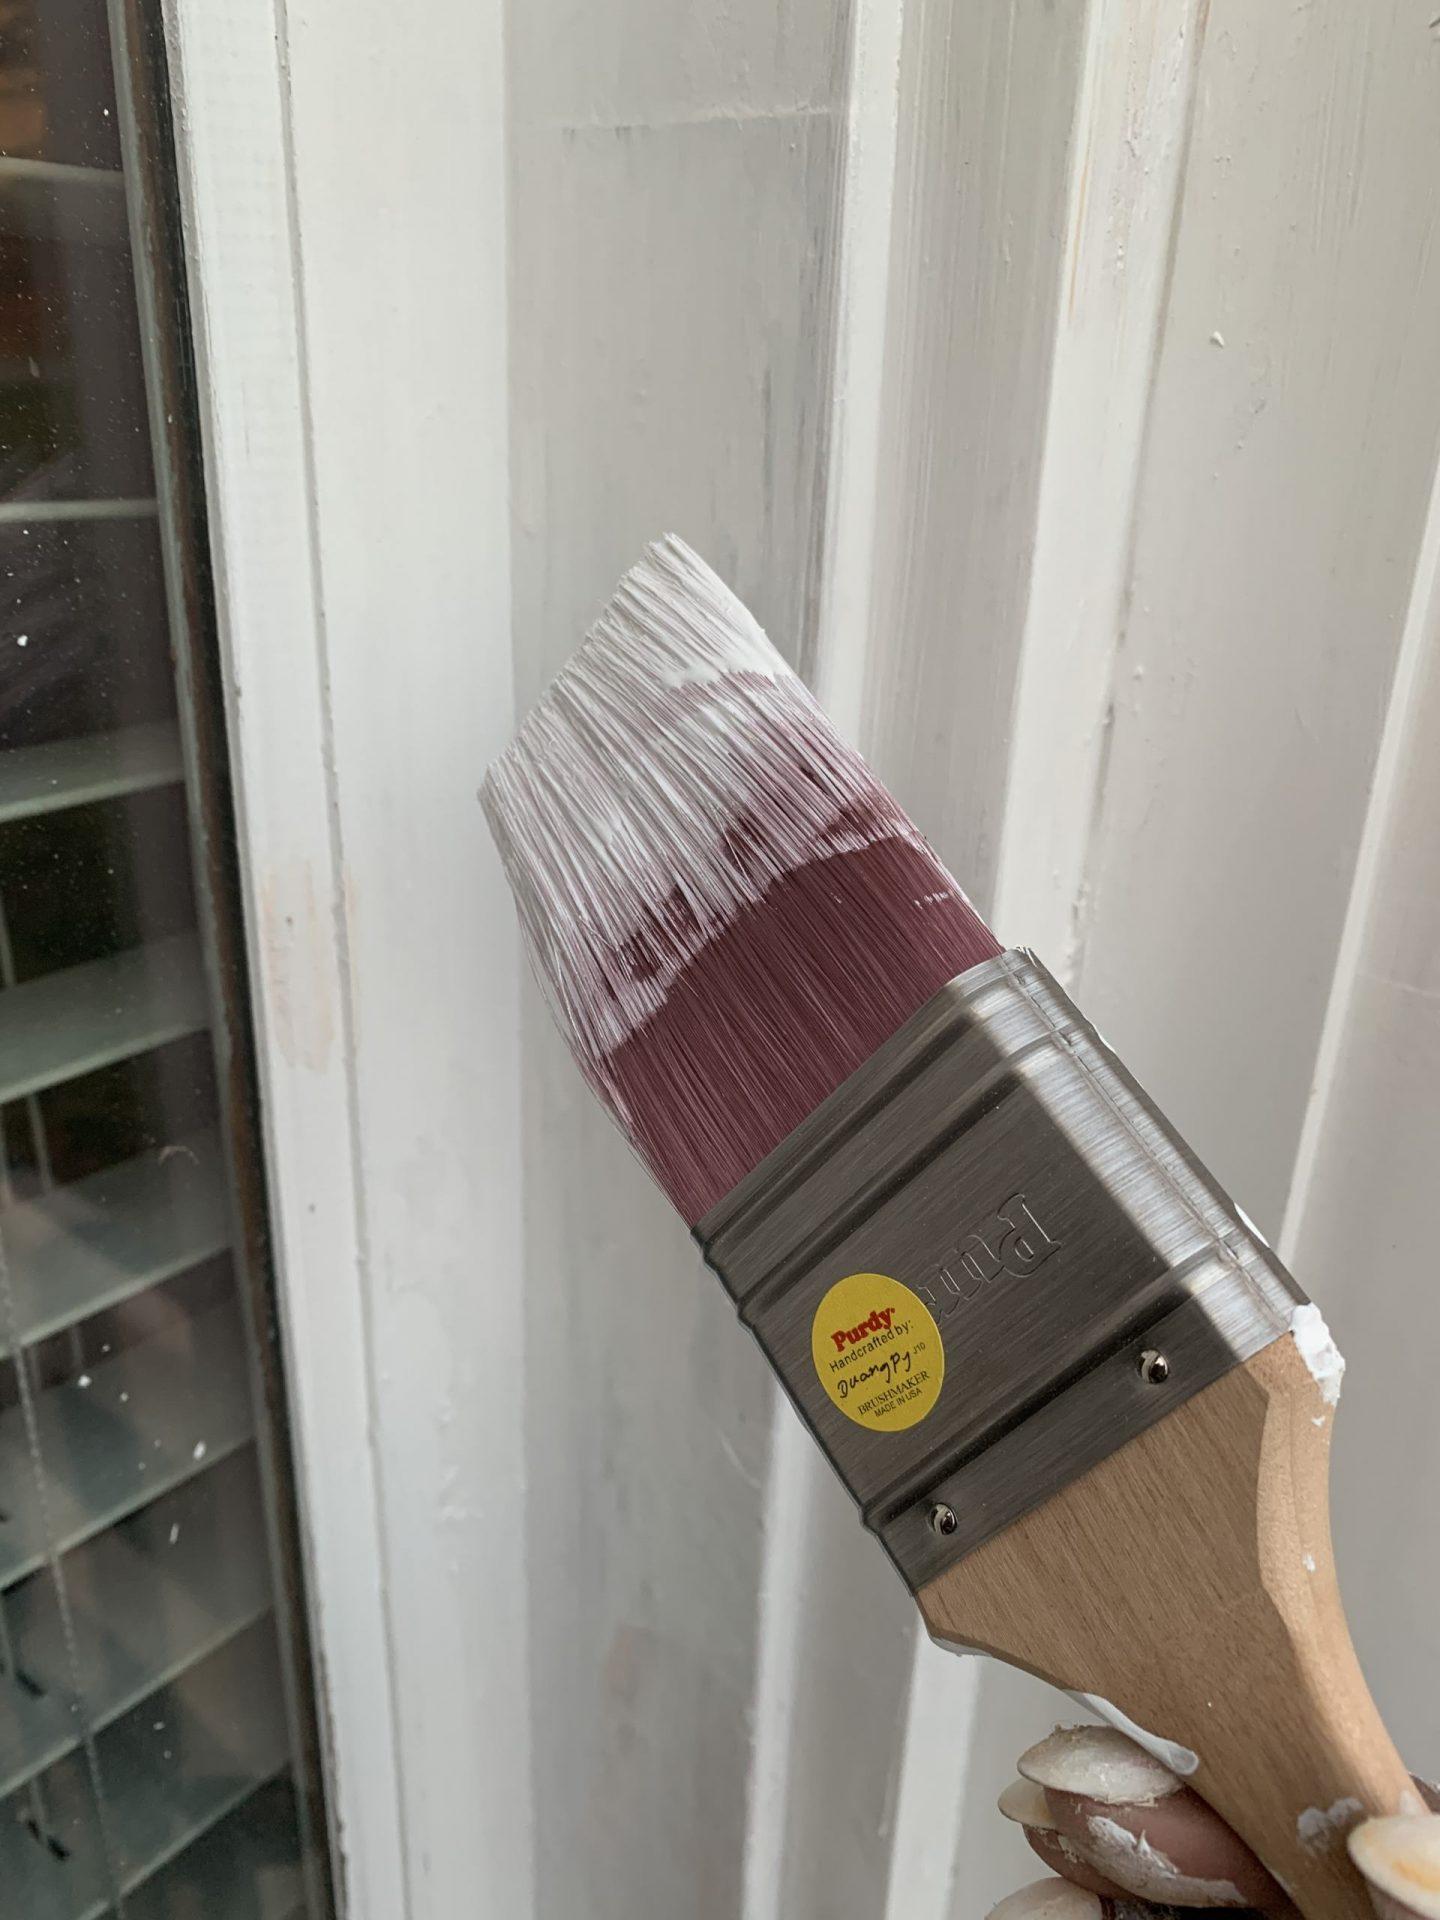 Purdy Nylox Brush